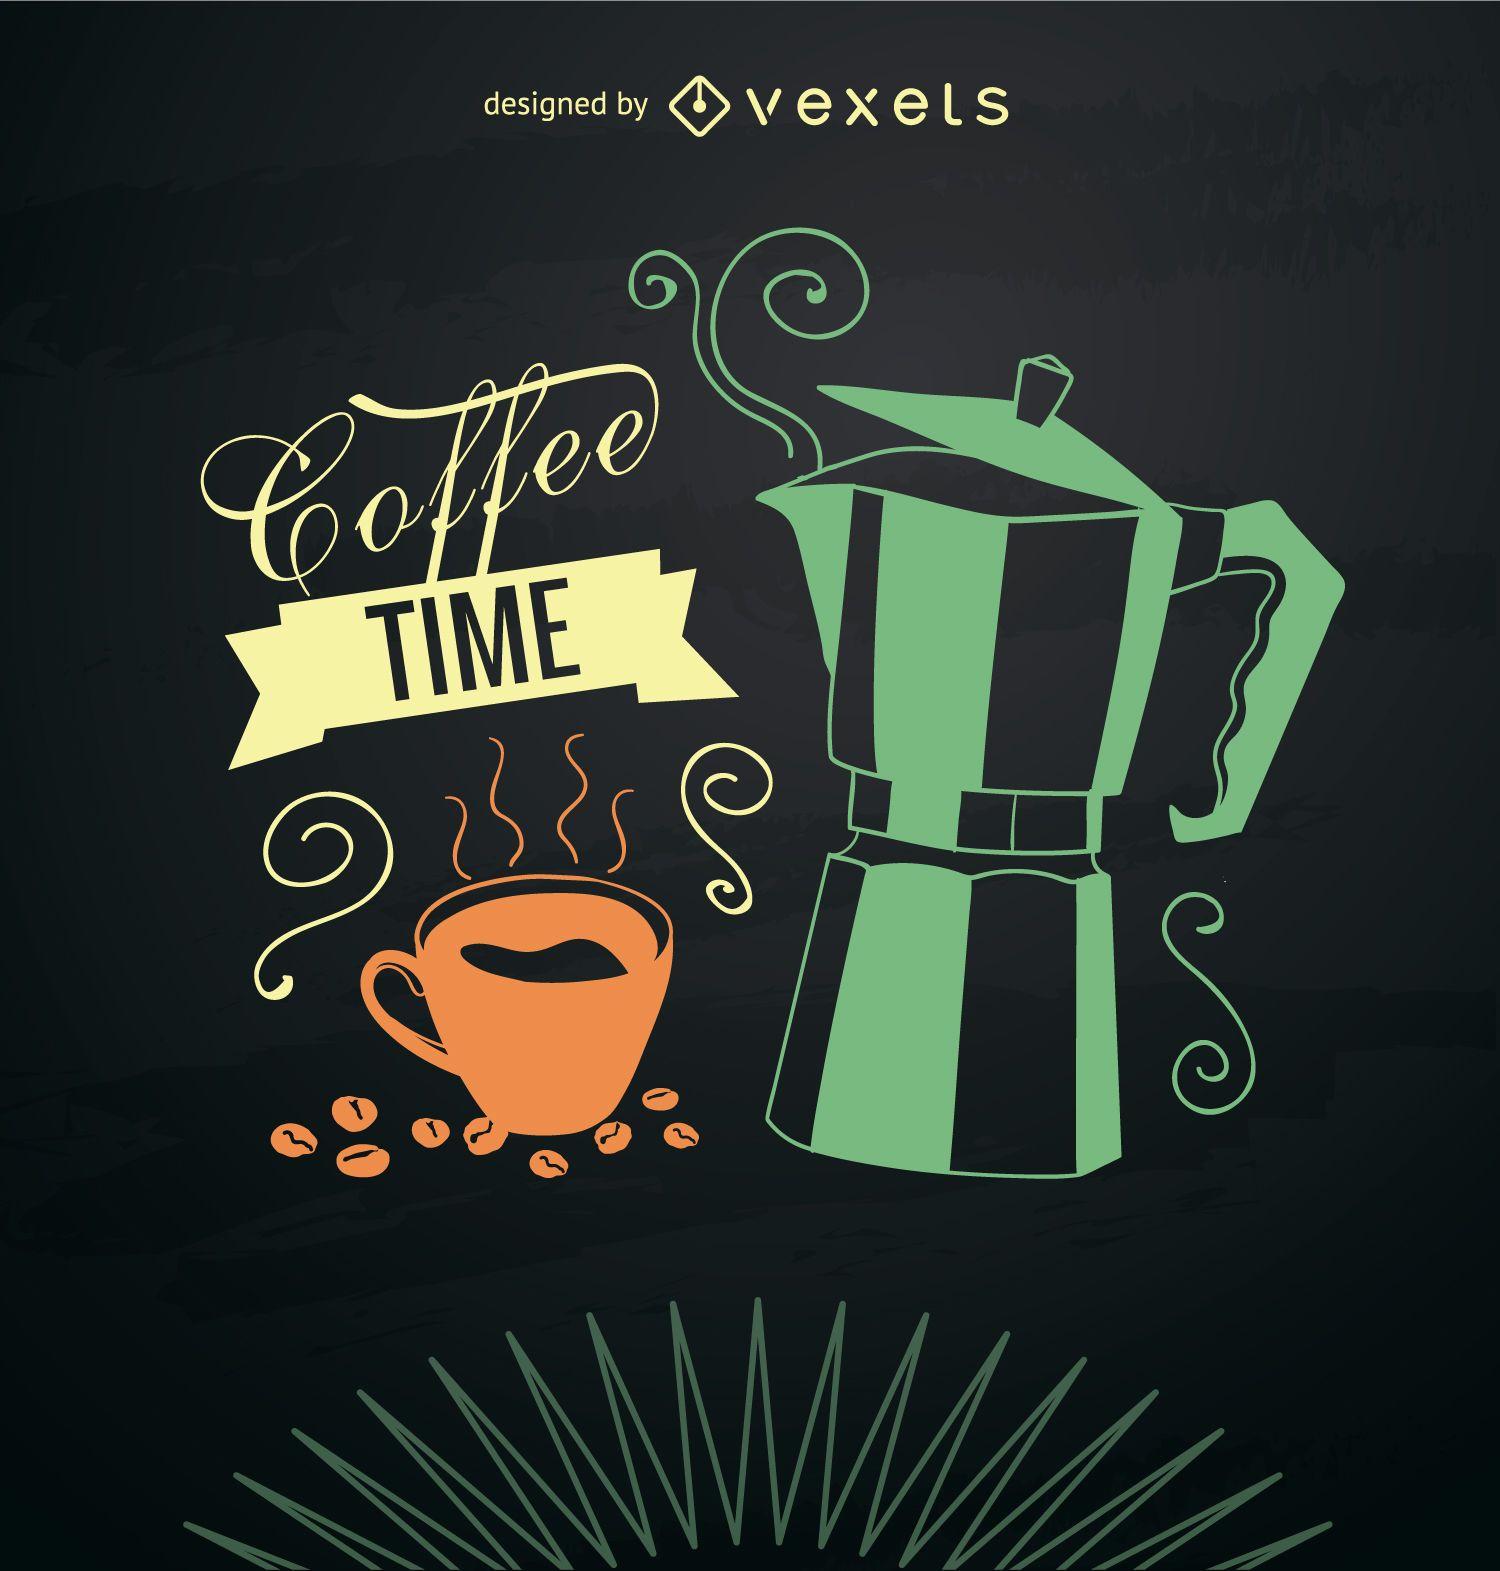 Smoky coffee maker card